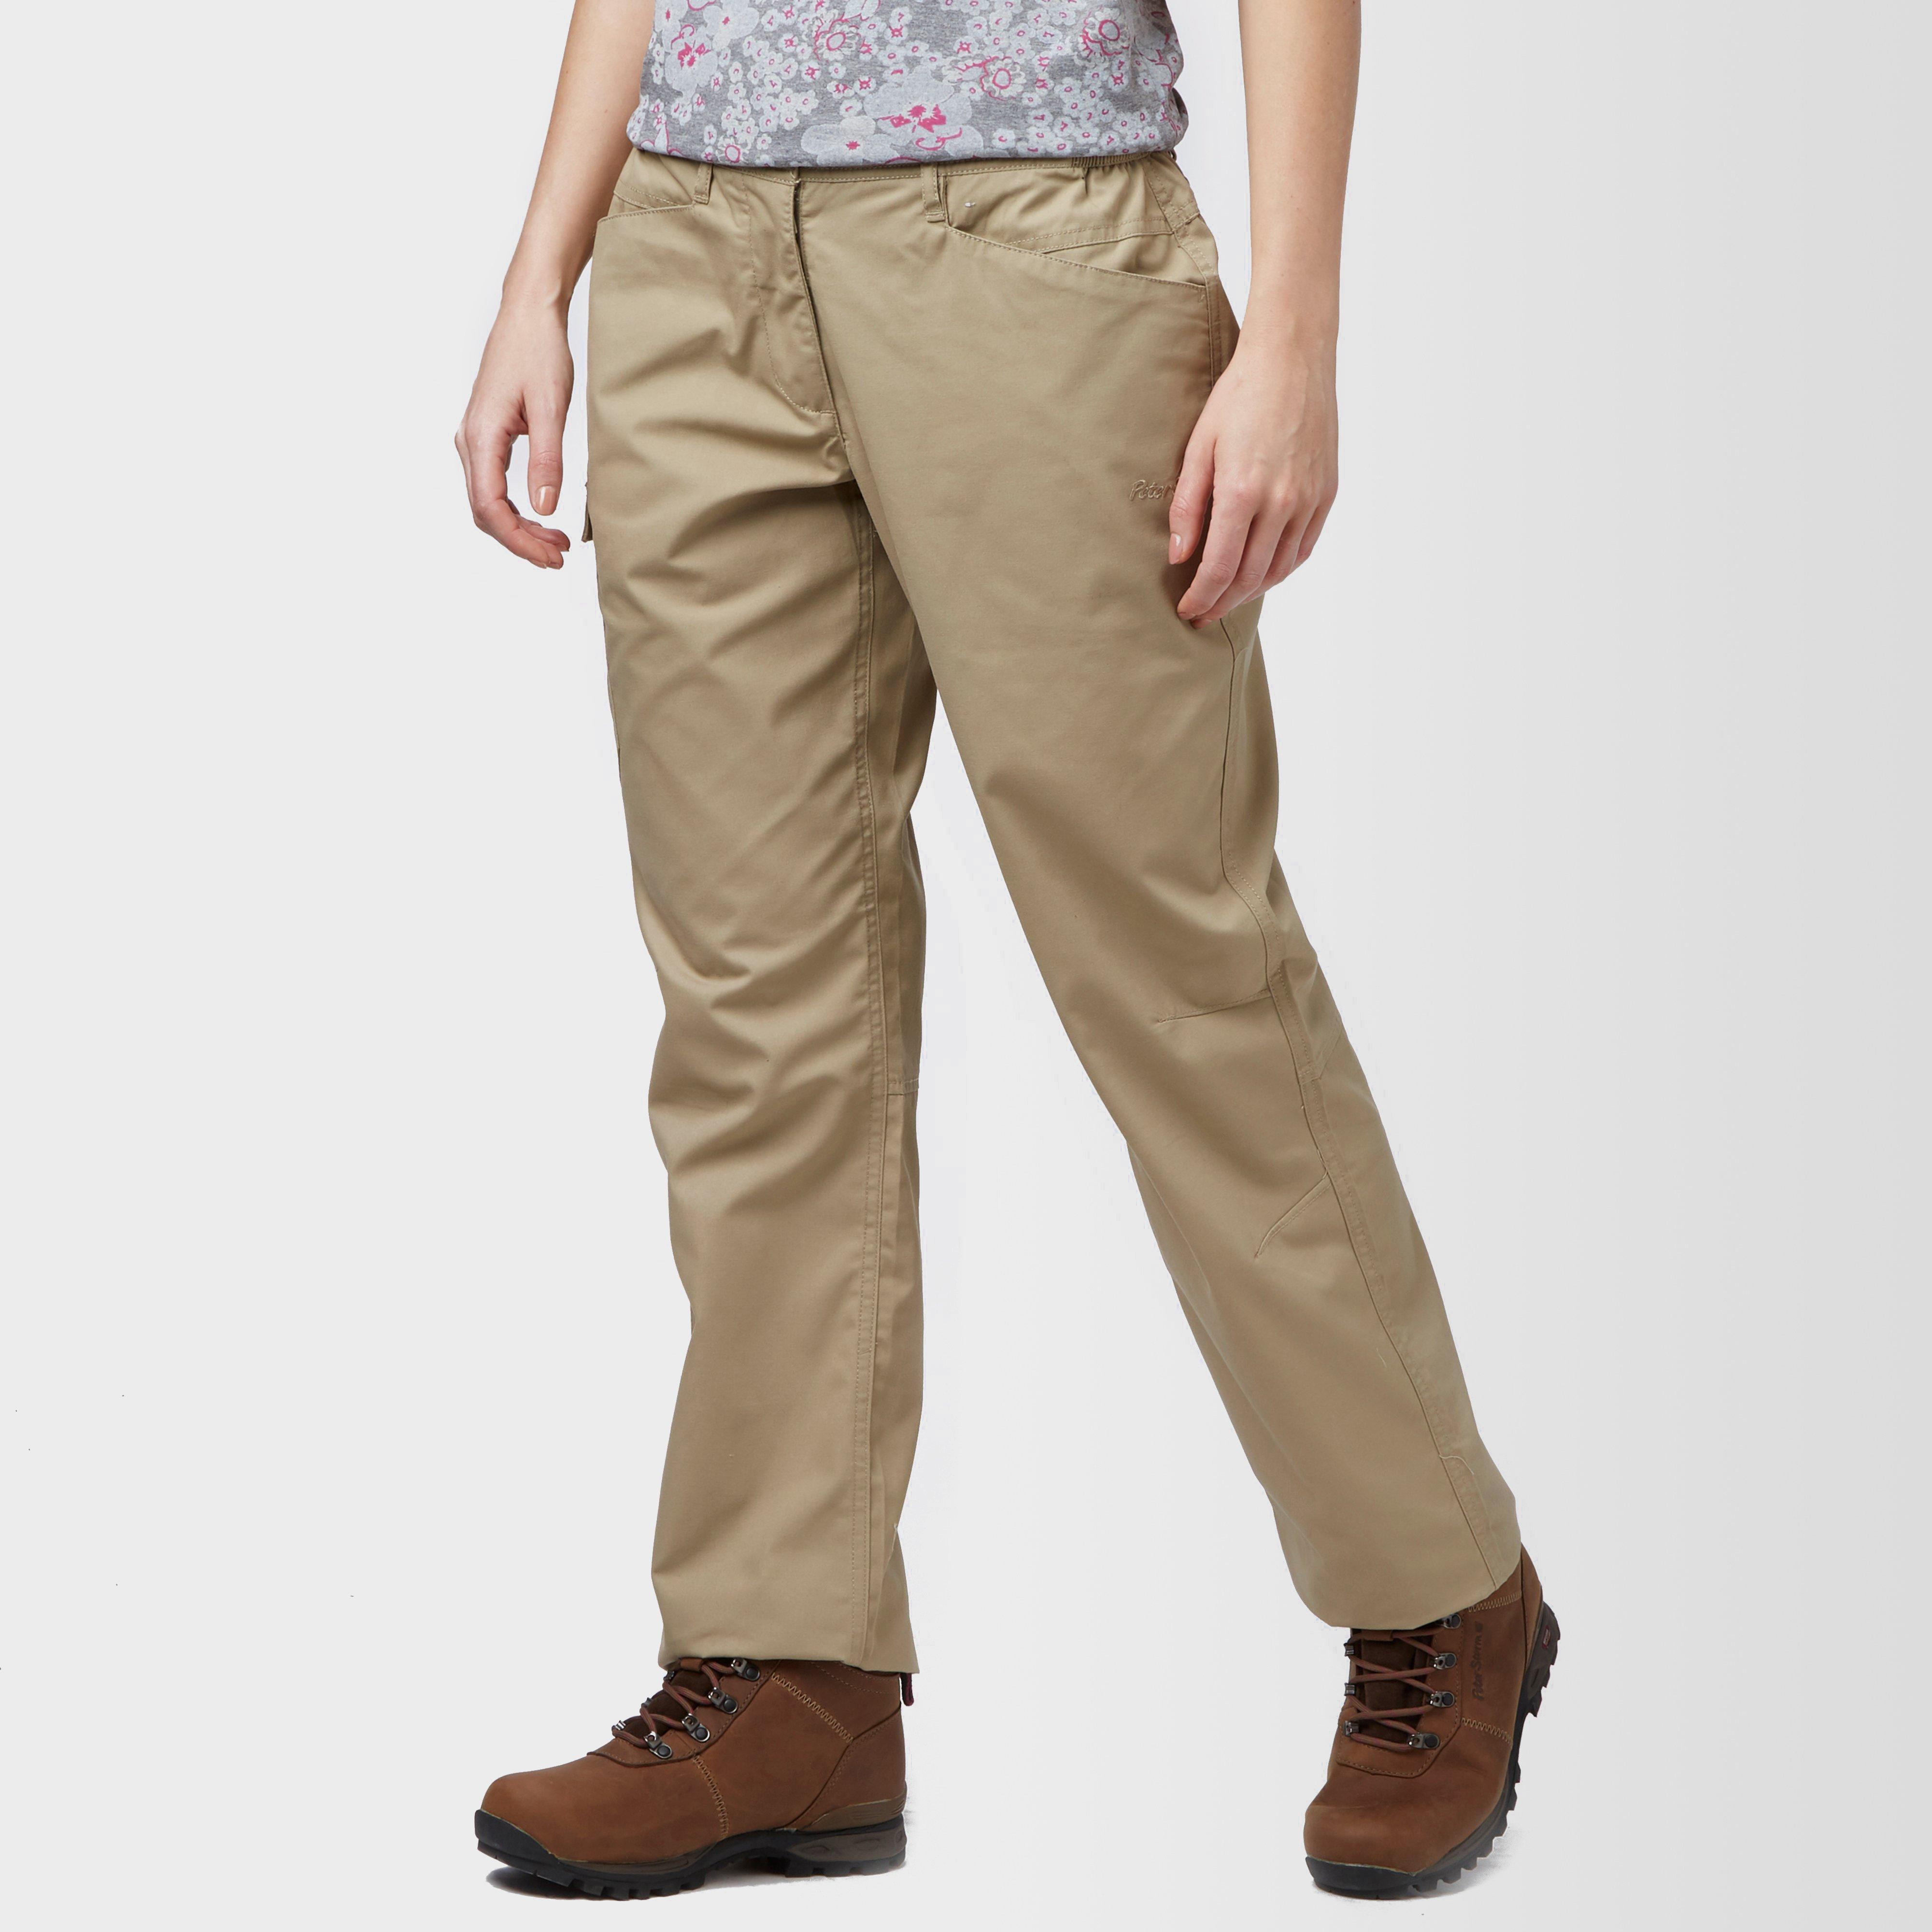 Peter Storm Peter Storm womens Ramble II Trousers - Beige, Beige